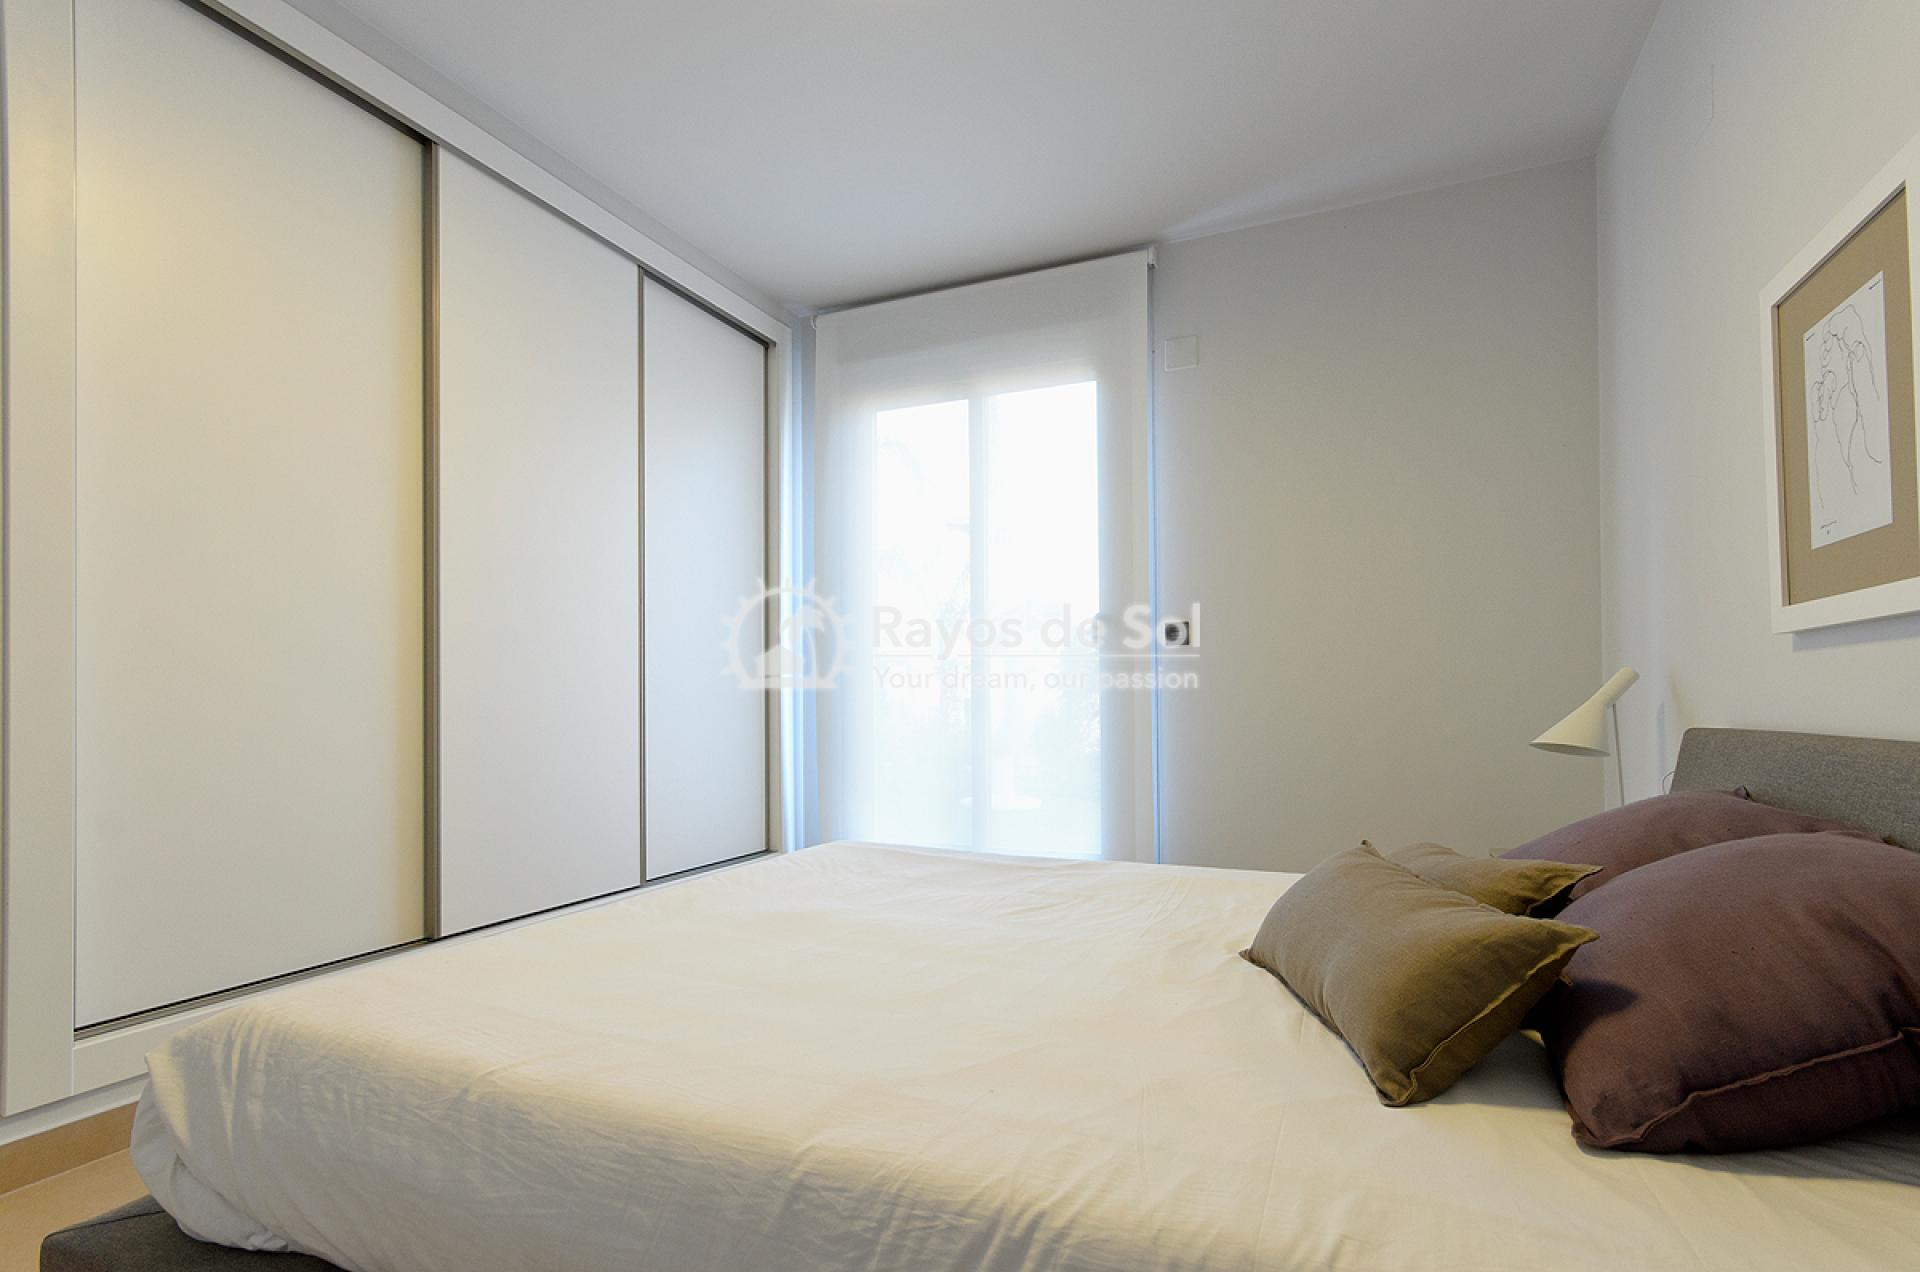 Golf apartment ground floor in Las Ramblas, Villamartin, Costa Blanca (VIPALO3-2B) - 11